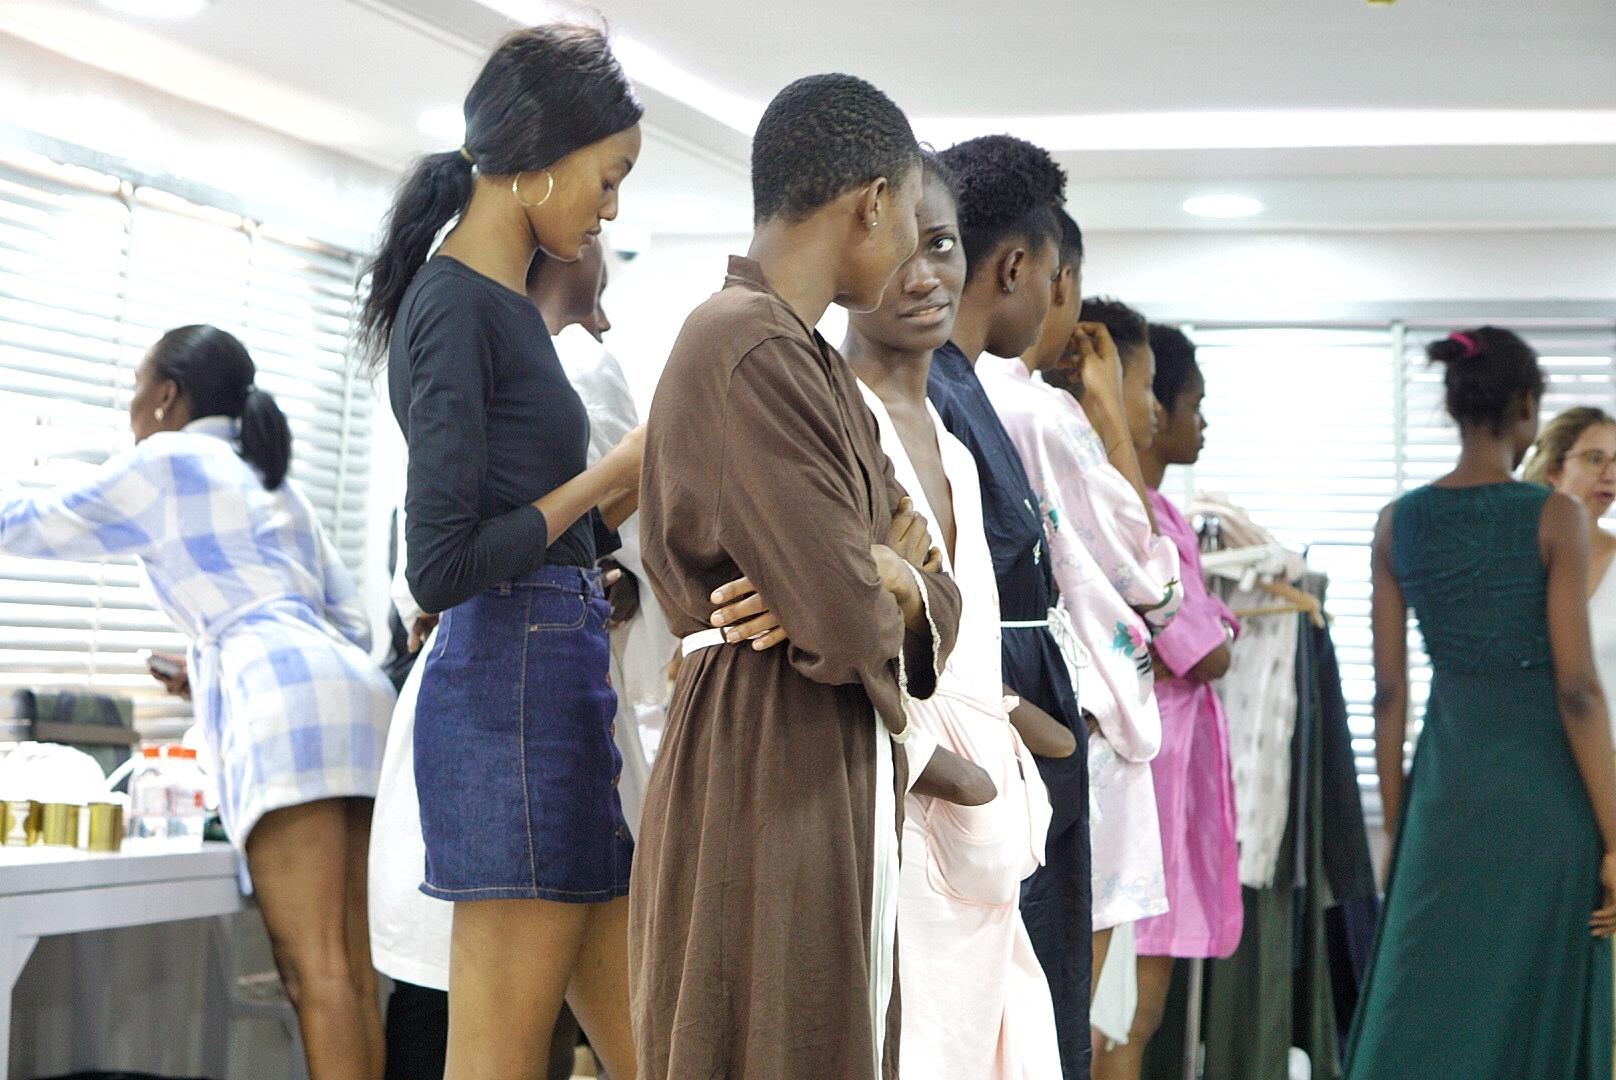 Models at gtbank fashion weekend 2017